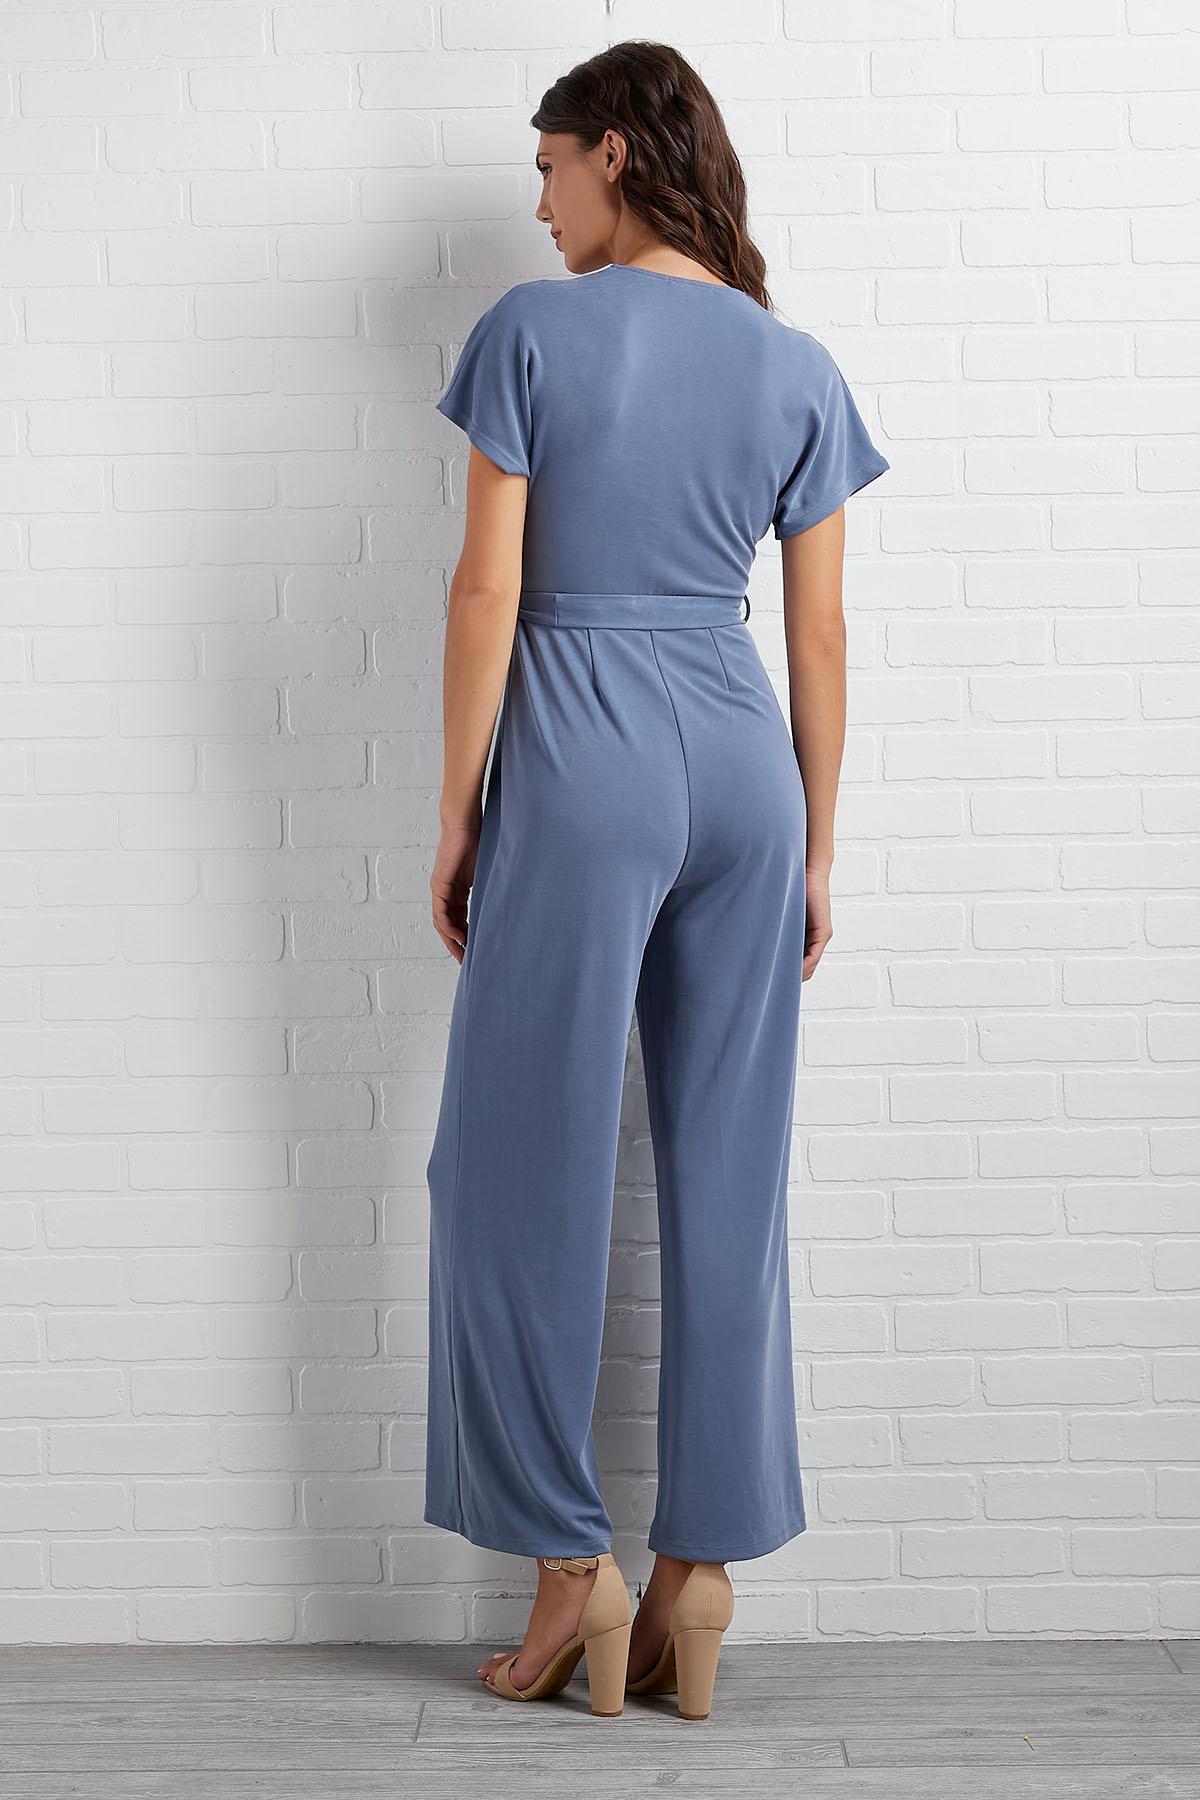 Dolman Sleeve Belted Jumpsuit